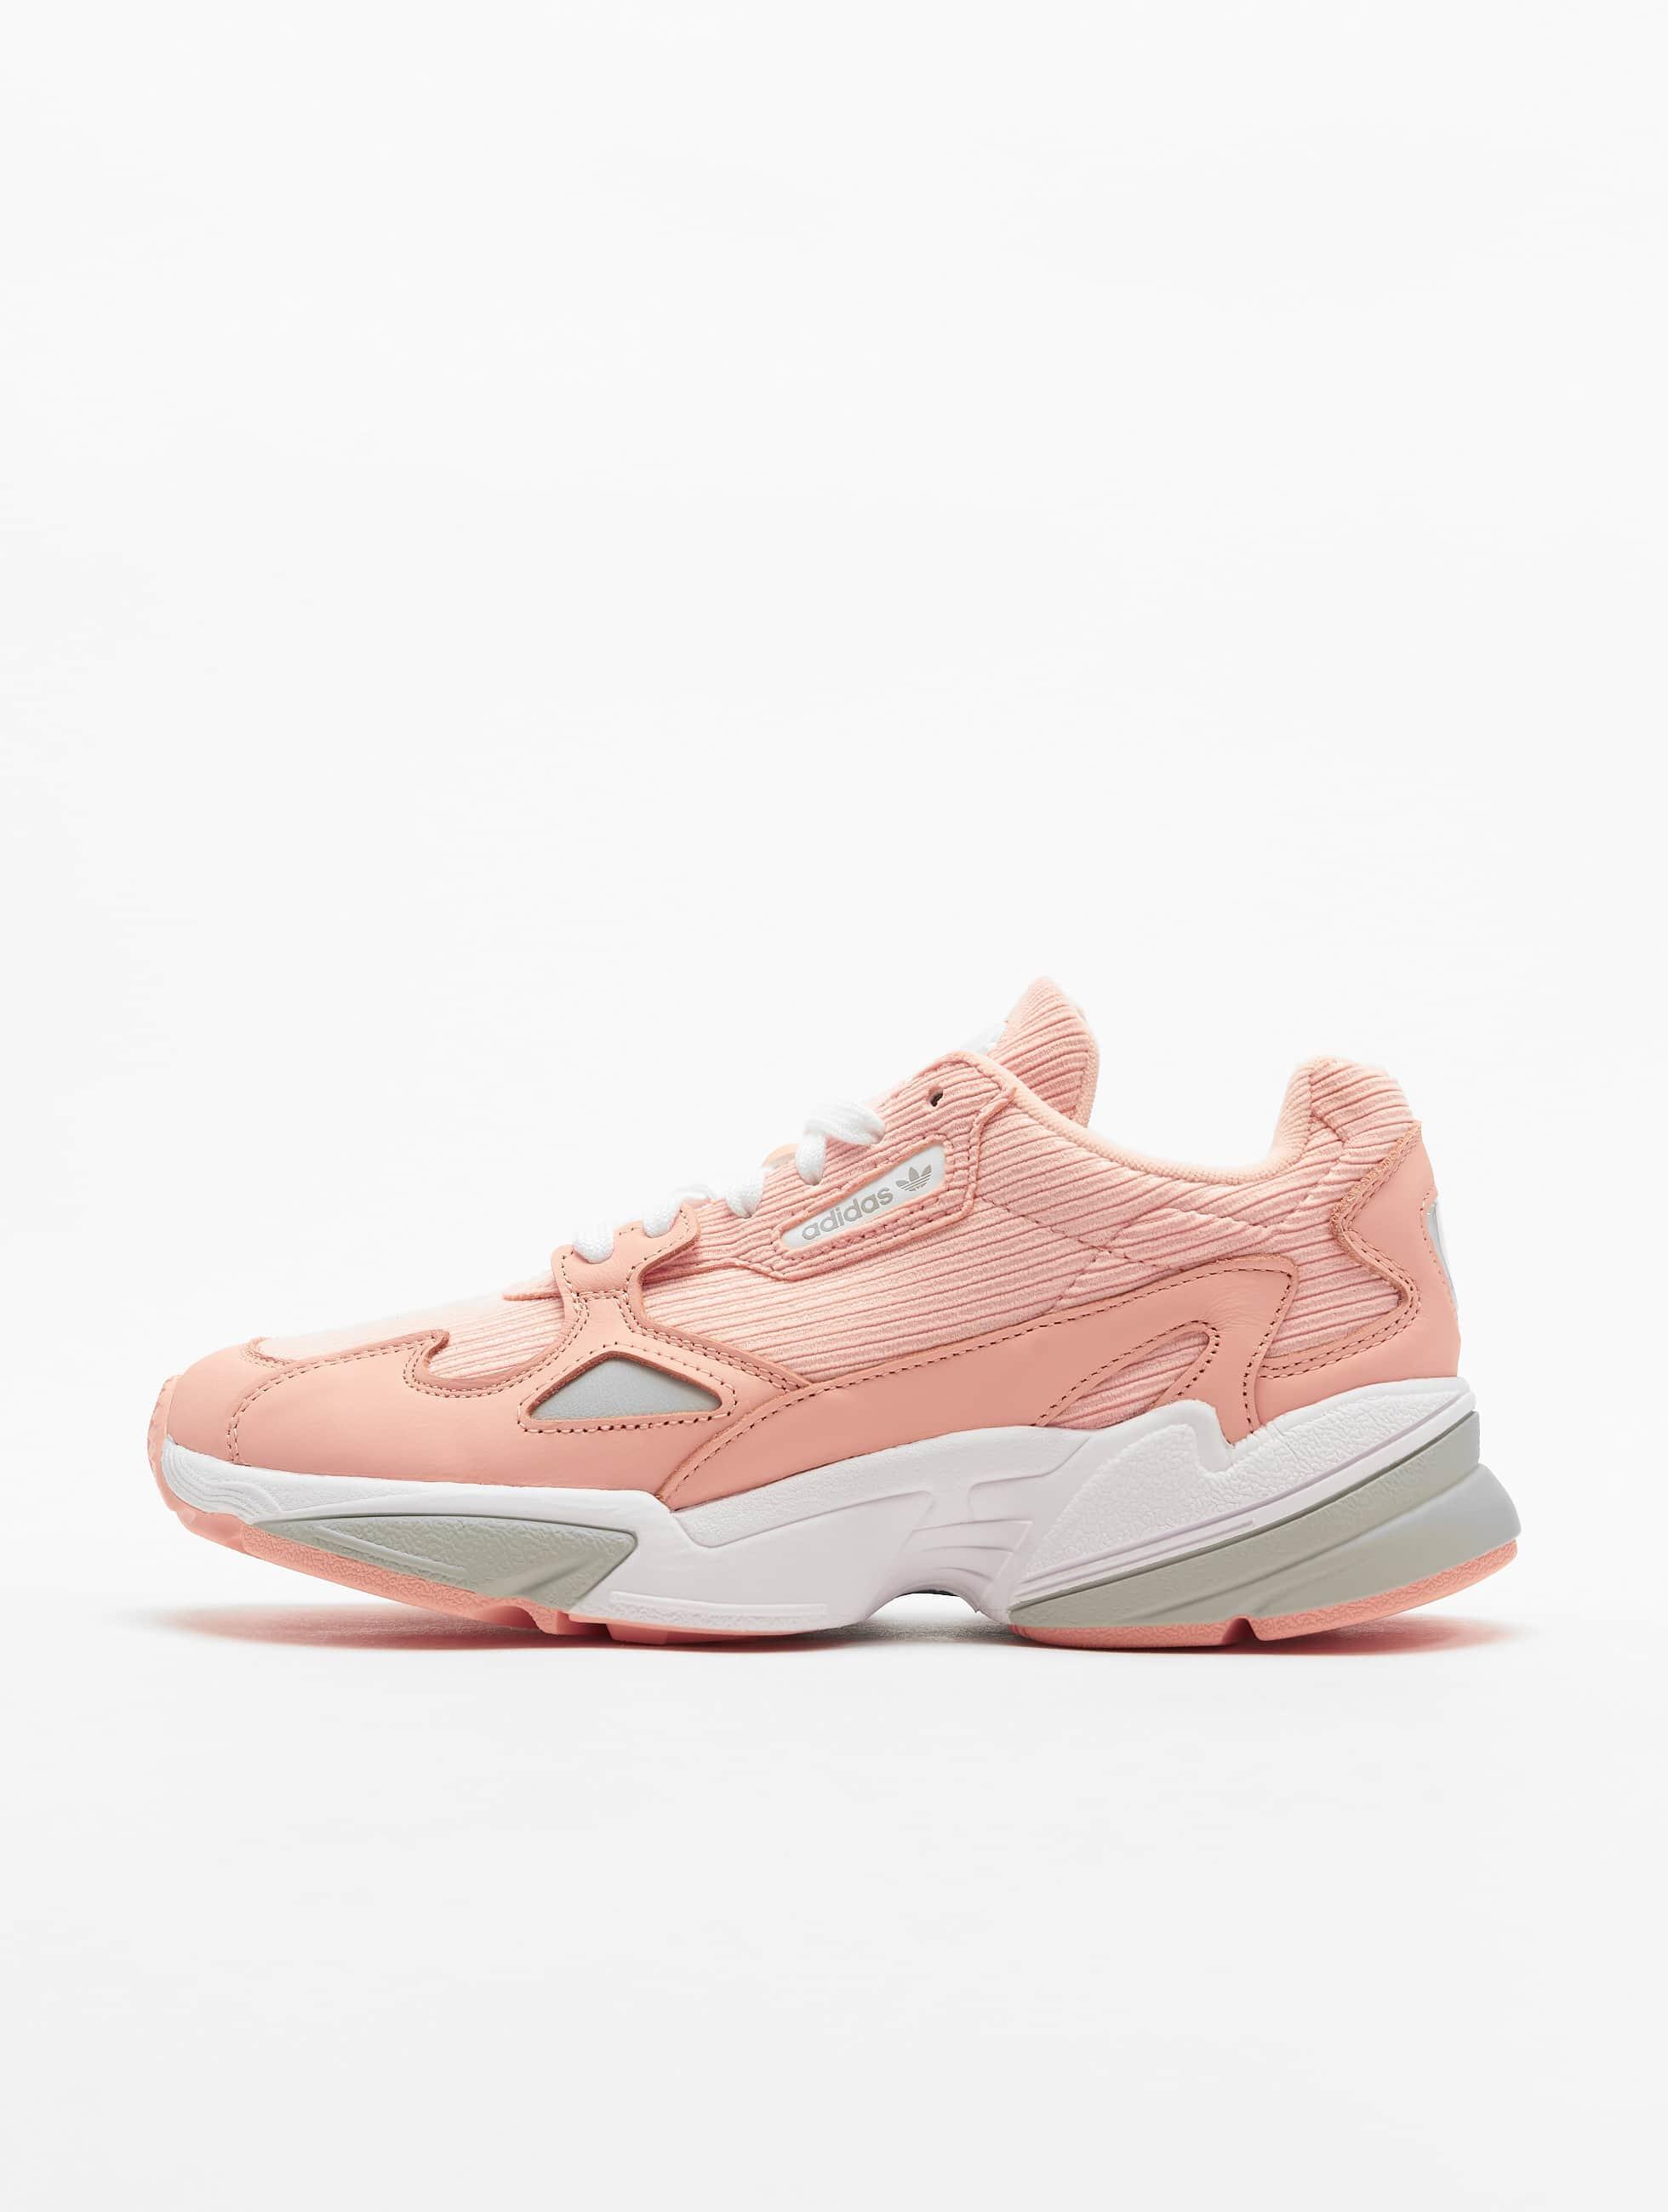 Adidas Originals Falcon Sneakers Glow Pink